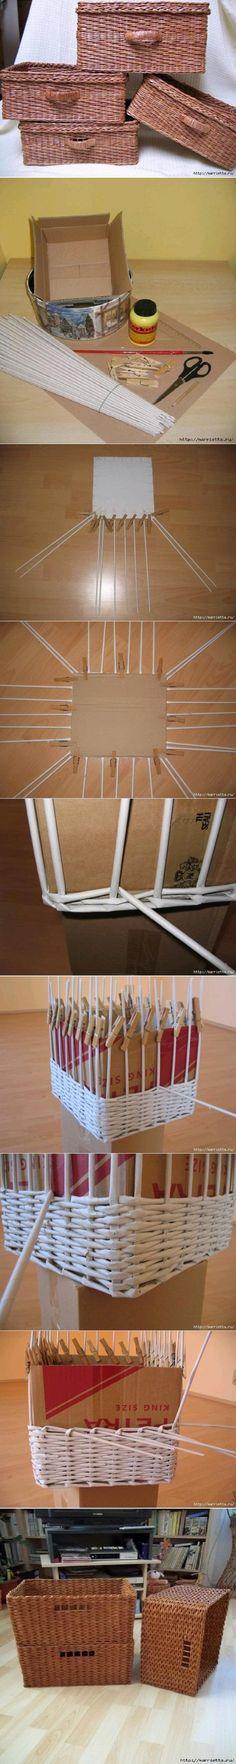 Journal bricolage Weave panier DIY journal Weave panier par diyforever